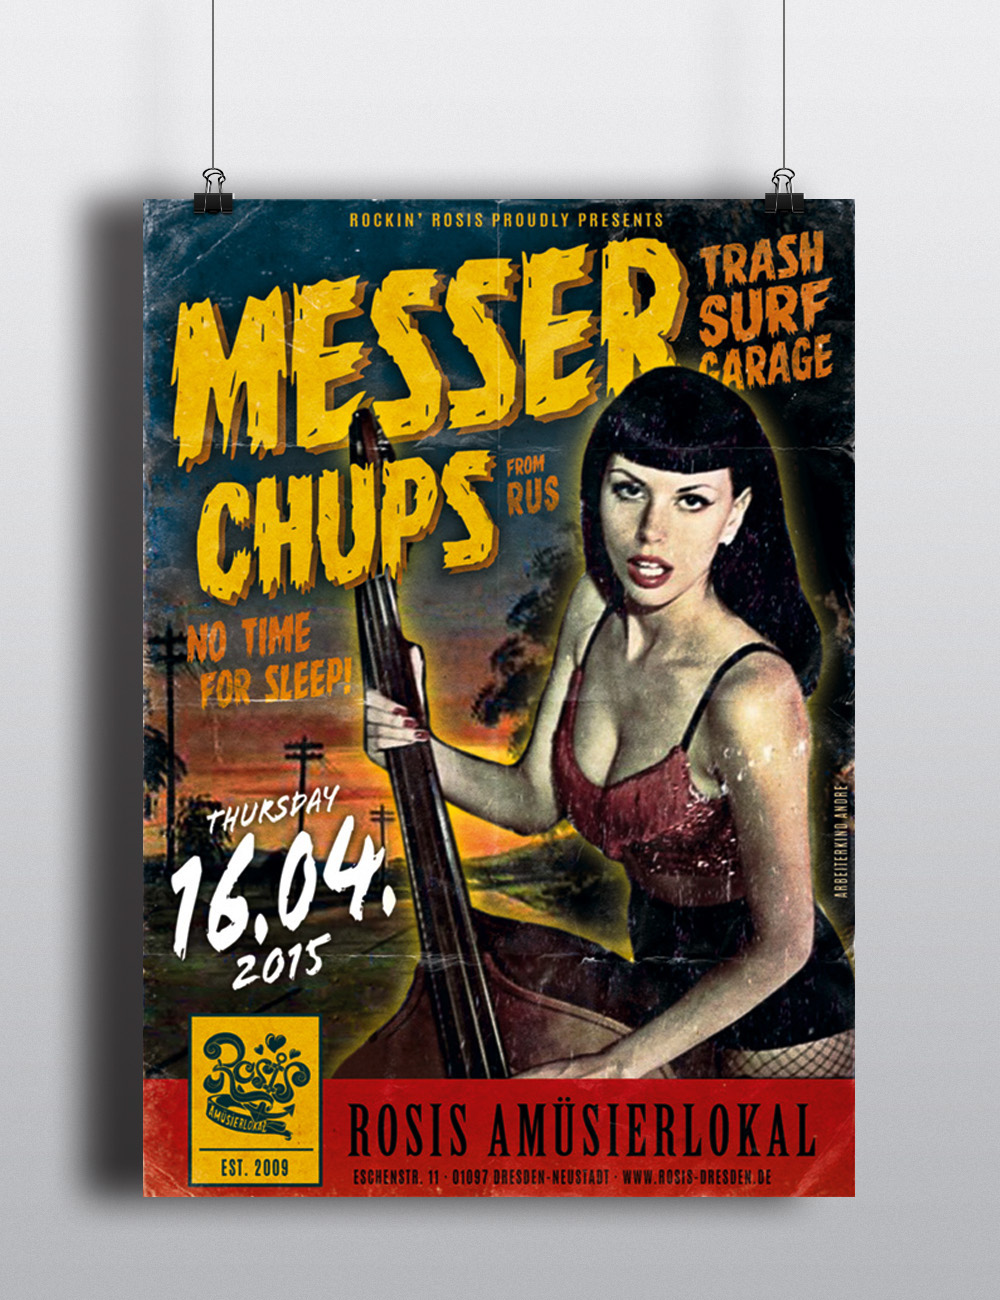 lettering signpainting vintage poster eventposter bandposter comic handpainted illustration